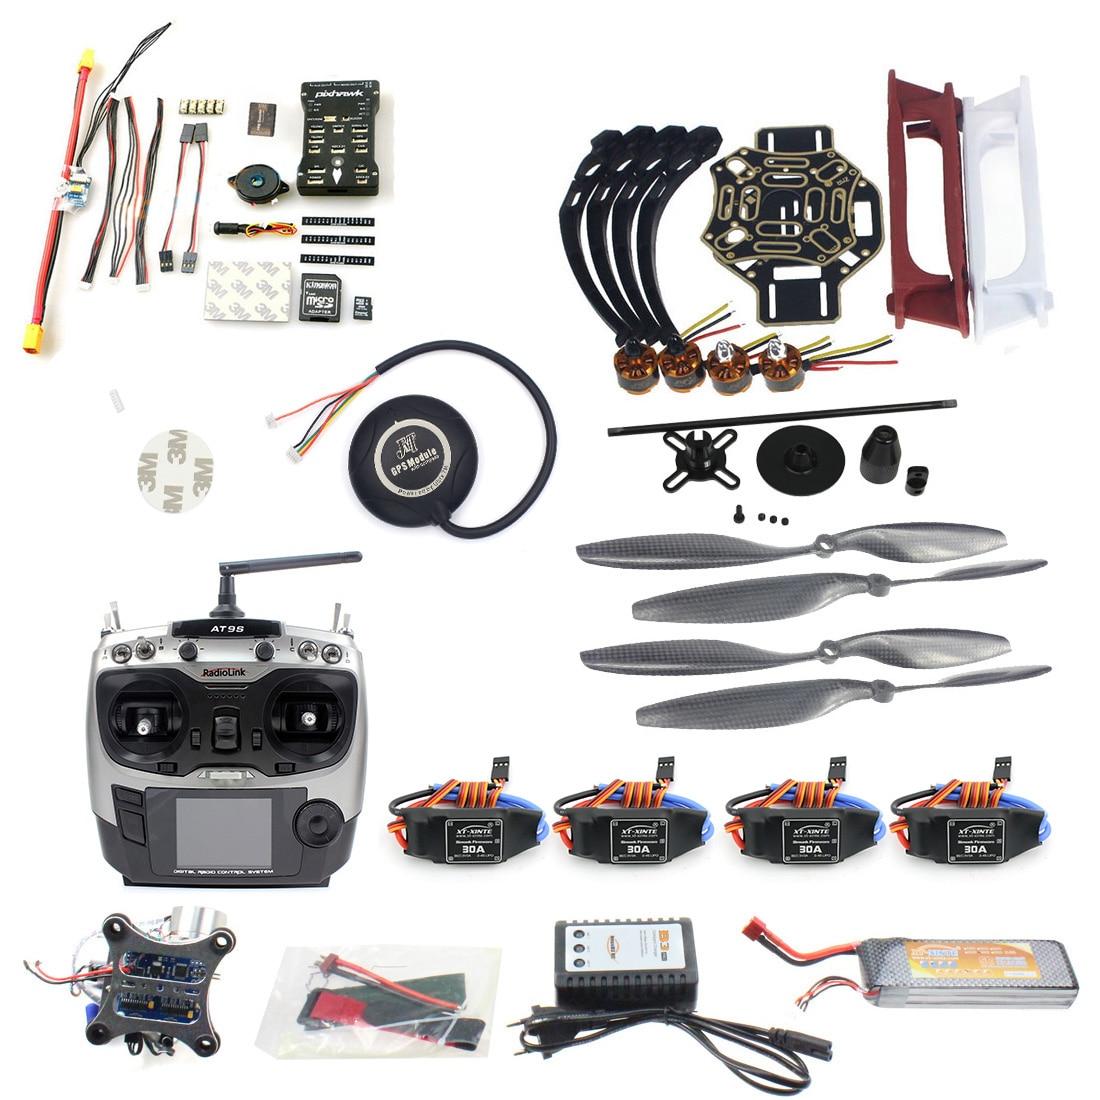 все цены на DIY FPV Drone Quadcopter 4-axle Aircraft Kit F450 450 Frame PXI PX4 Flight Control 920KV Motor GPS AT9 Transmitter F02192-AE онлайн